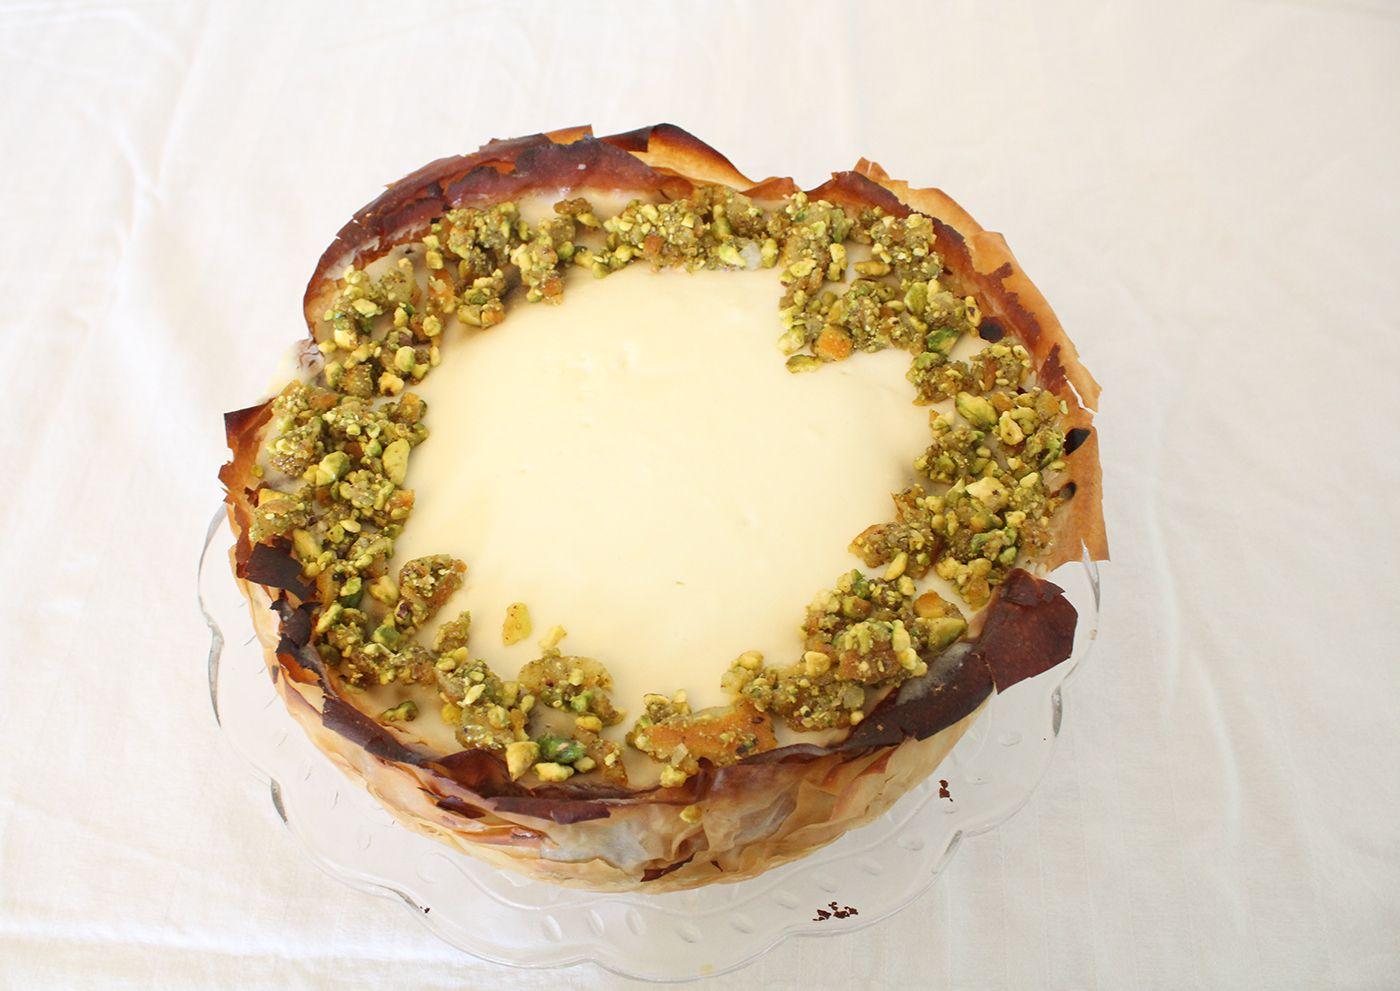 IMG 3328 - עוגת גבינה בעלי פילו